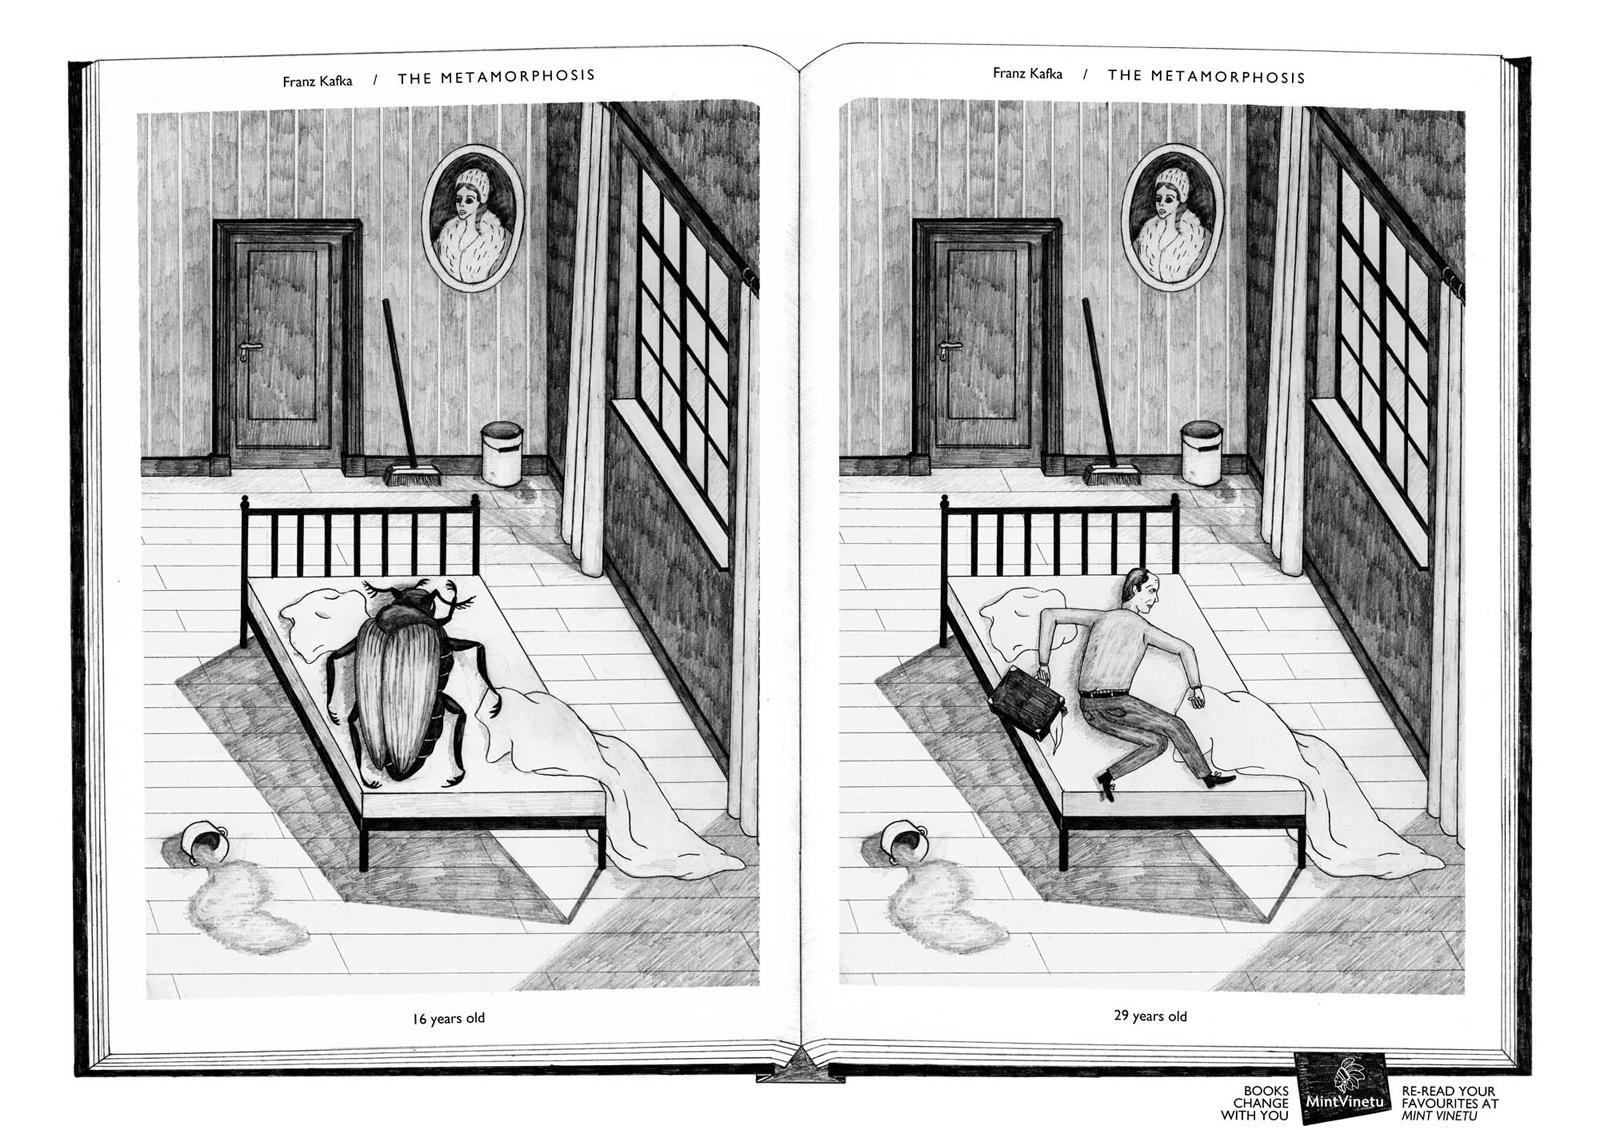 Mint Vinetu Print Ad -  Books Change With You, The Methamorphosis